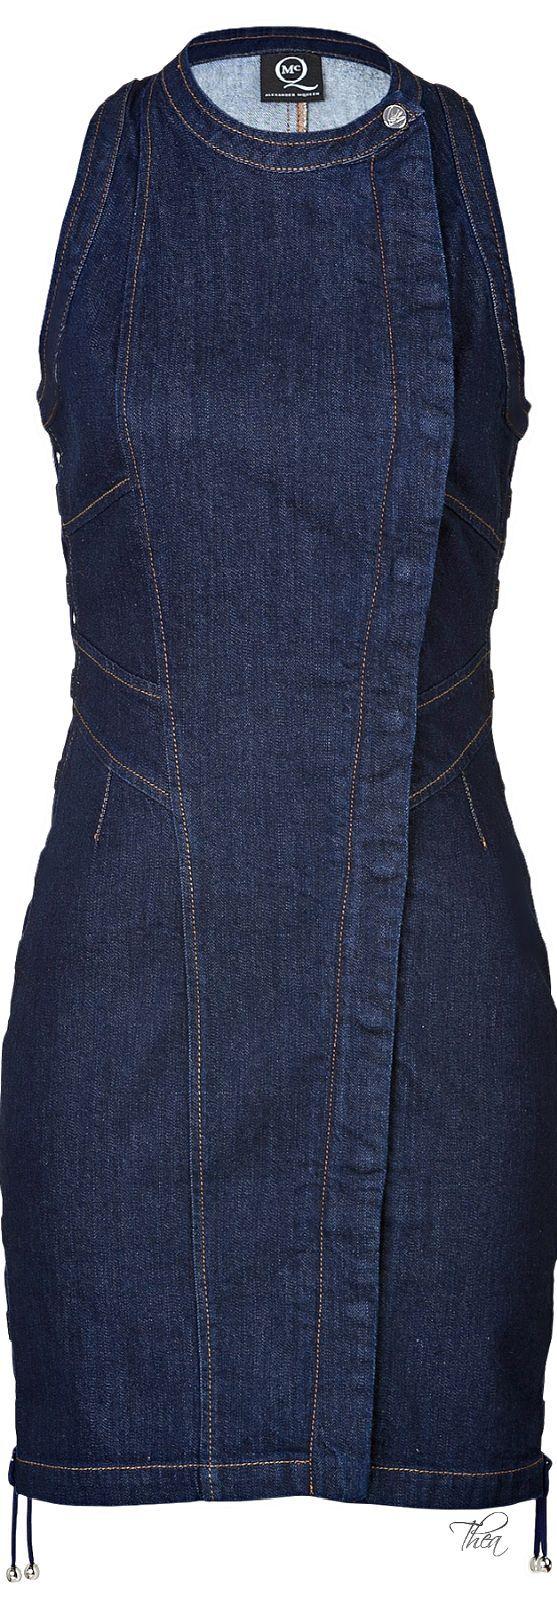 McQ by Alexander McQueen Blue Bodycon Denim Dress | The House of Beccaria~: https://br.pinterest.com/source/pinterest.com/